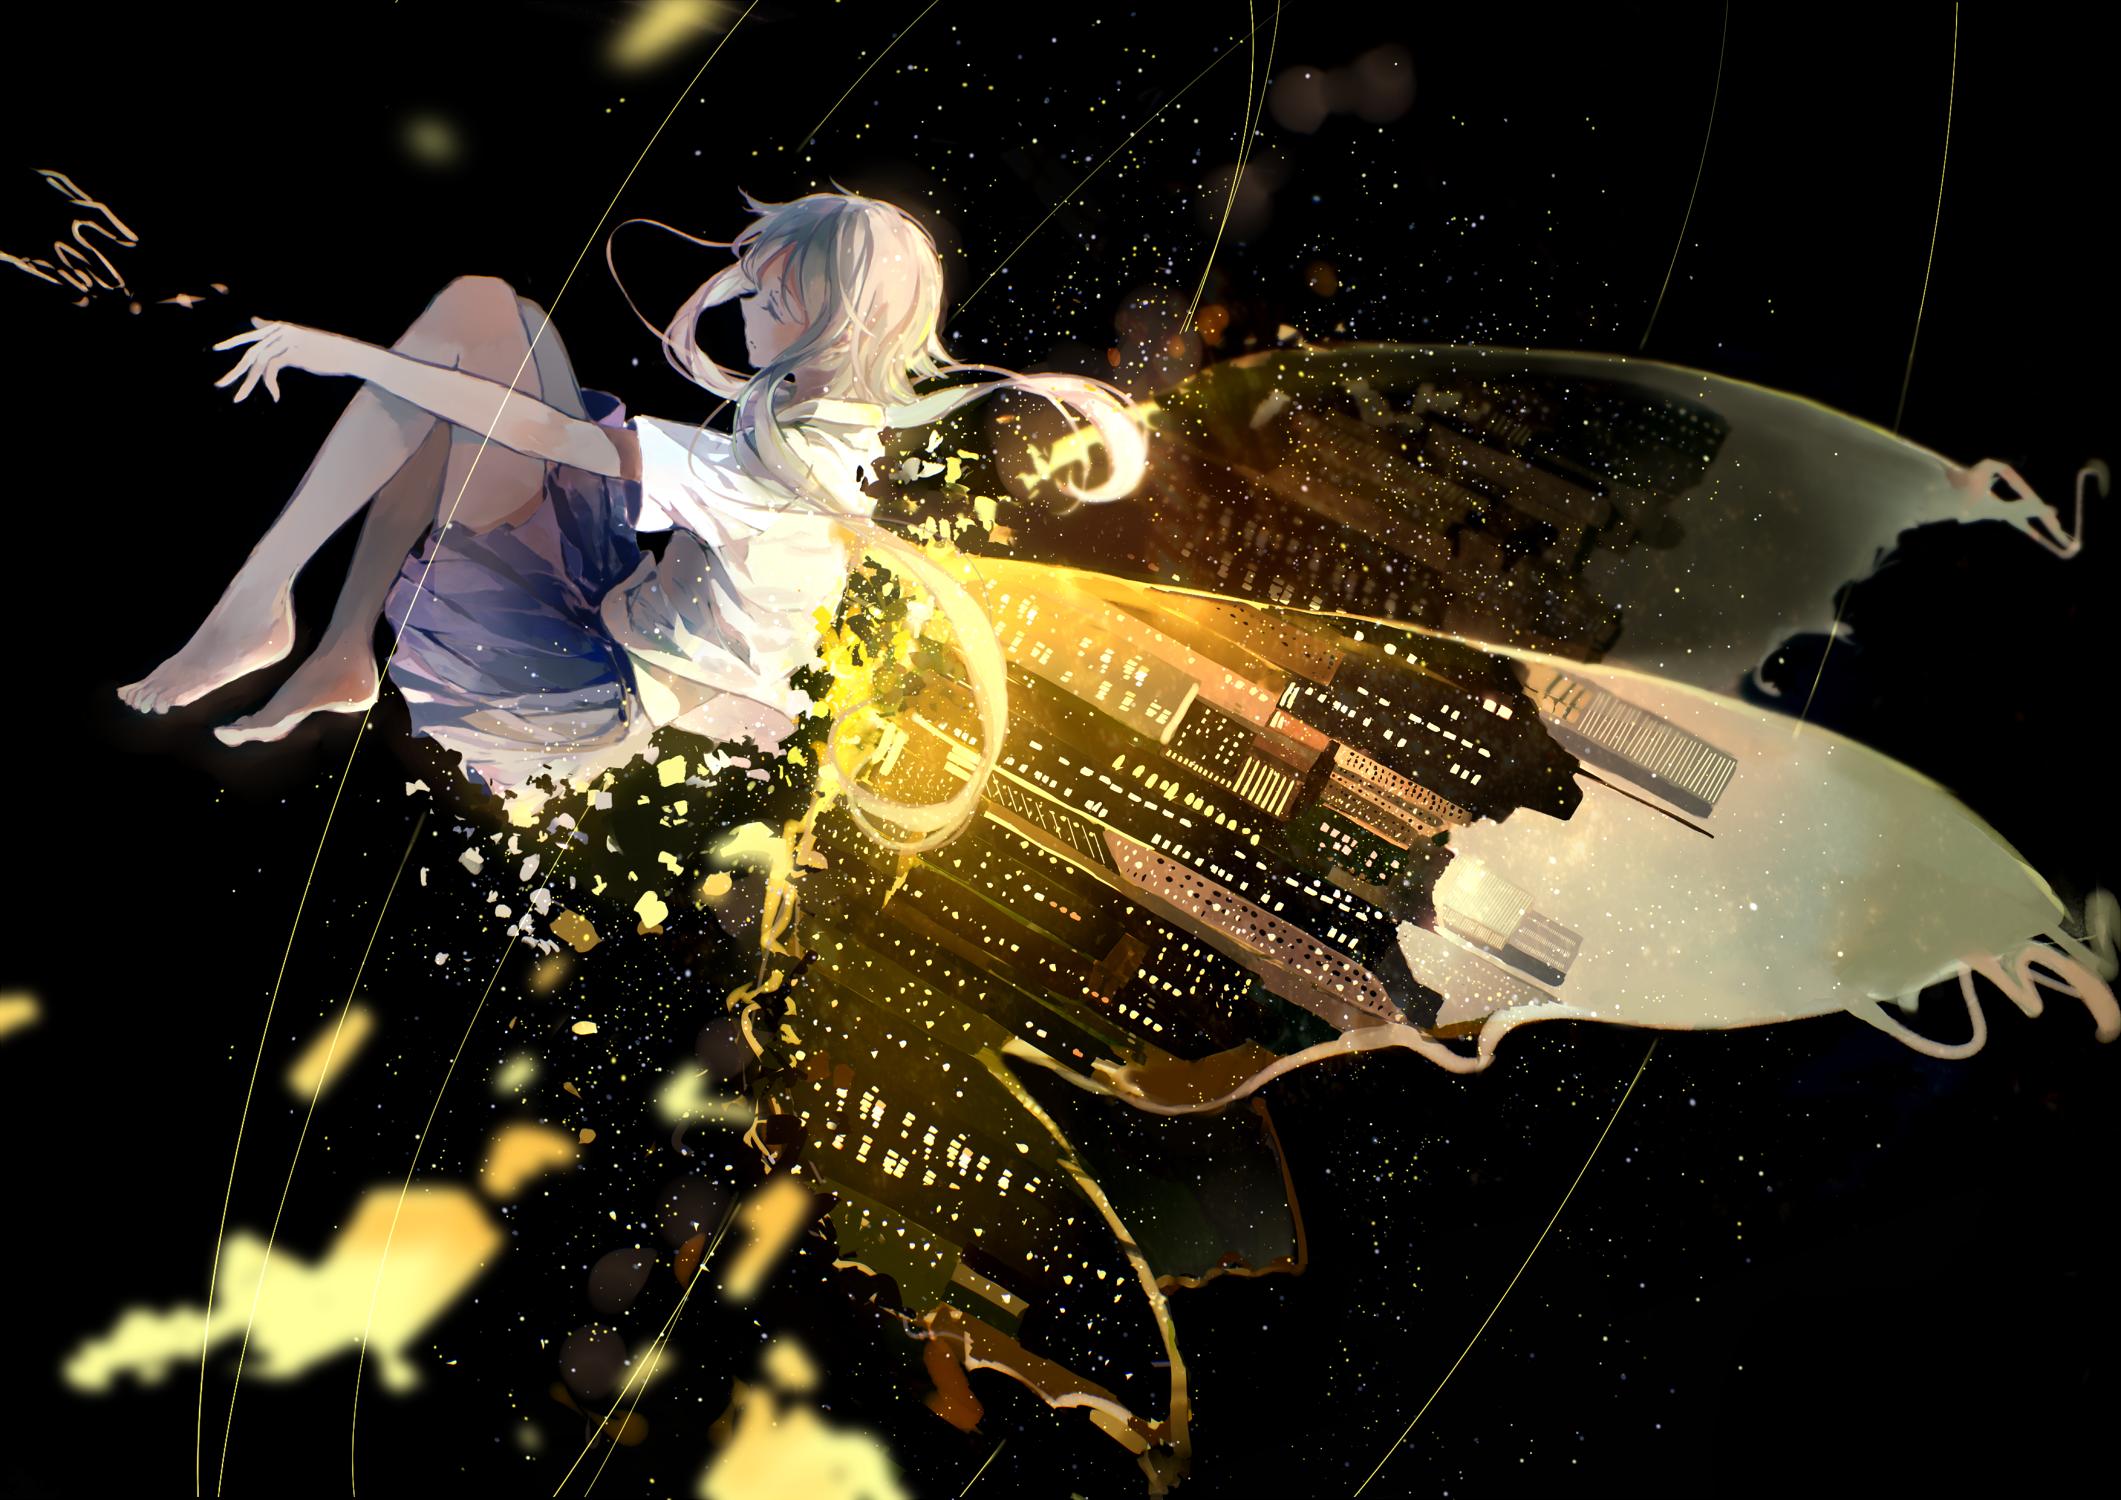 id=47955642,动漫妖精壁纸,动漫女生图片,动漫唯美壁纸